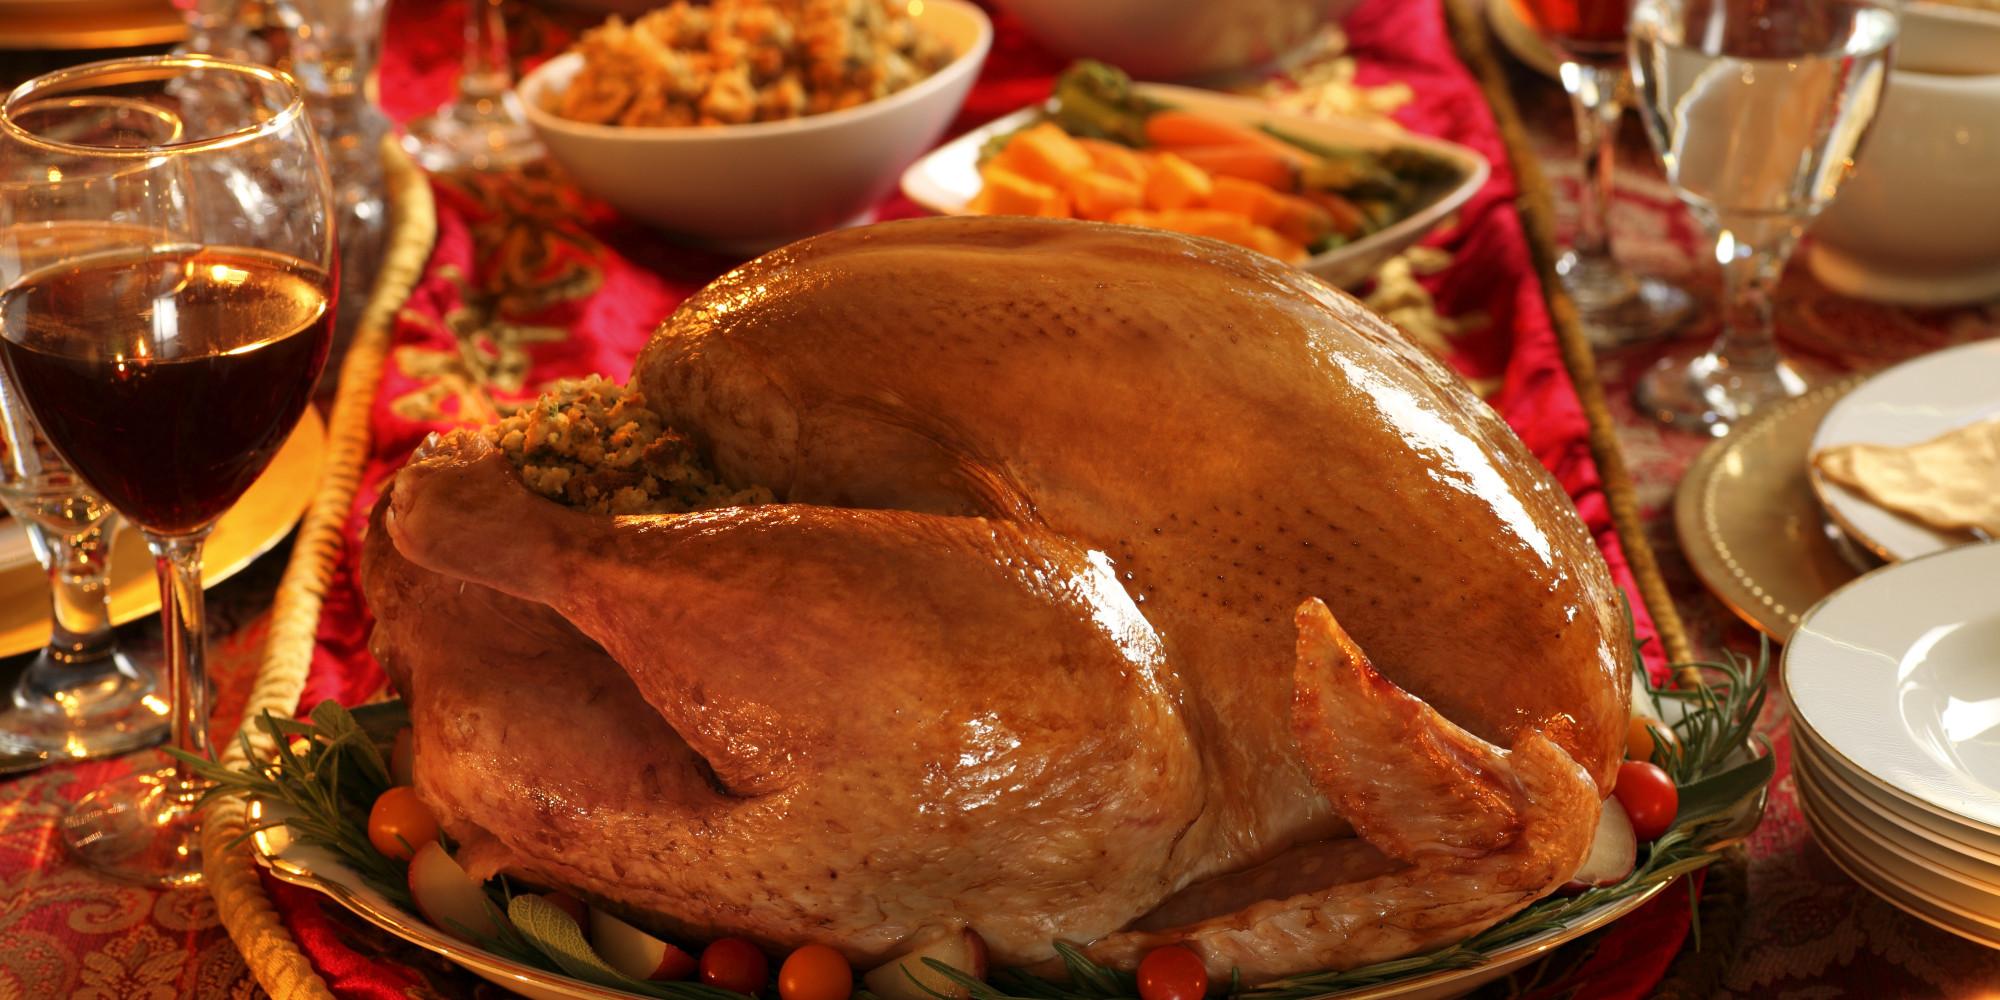 Thanksgiving Dinner Restaurants  Can't Cook R4L s Top 5 Restaurants Serving Thanksgiving